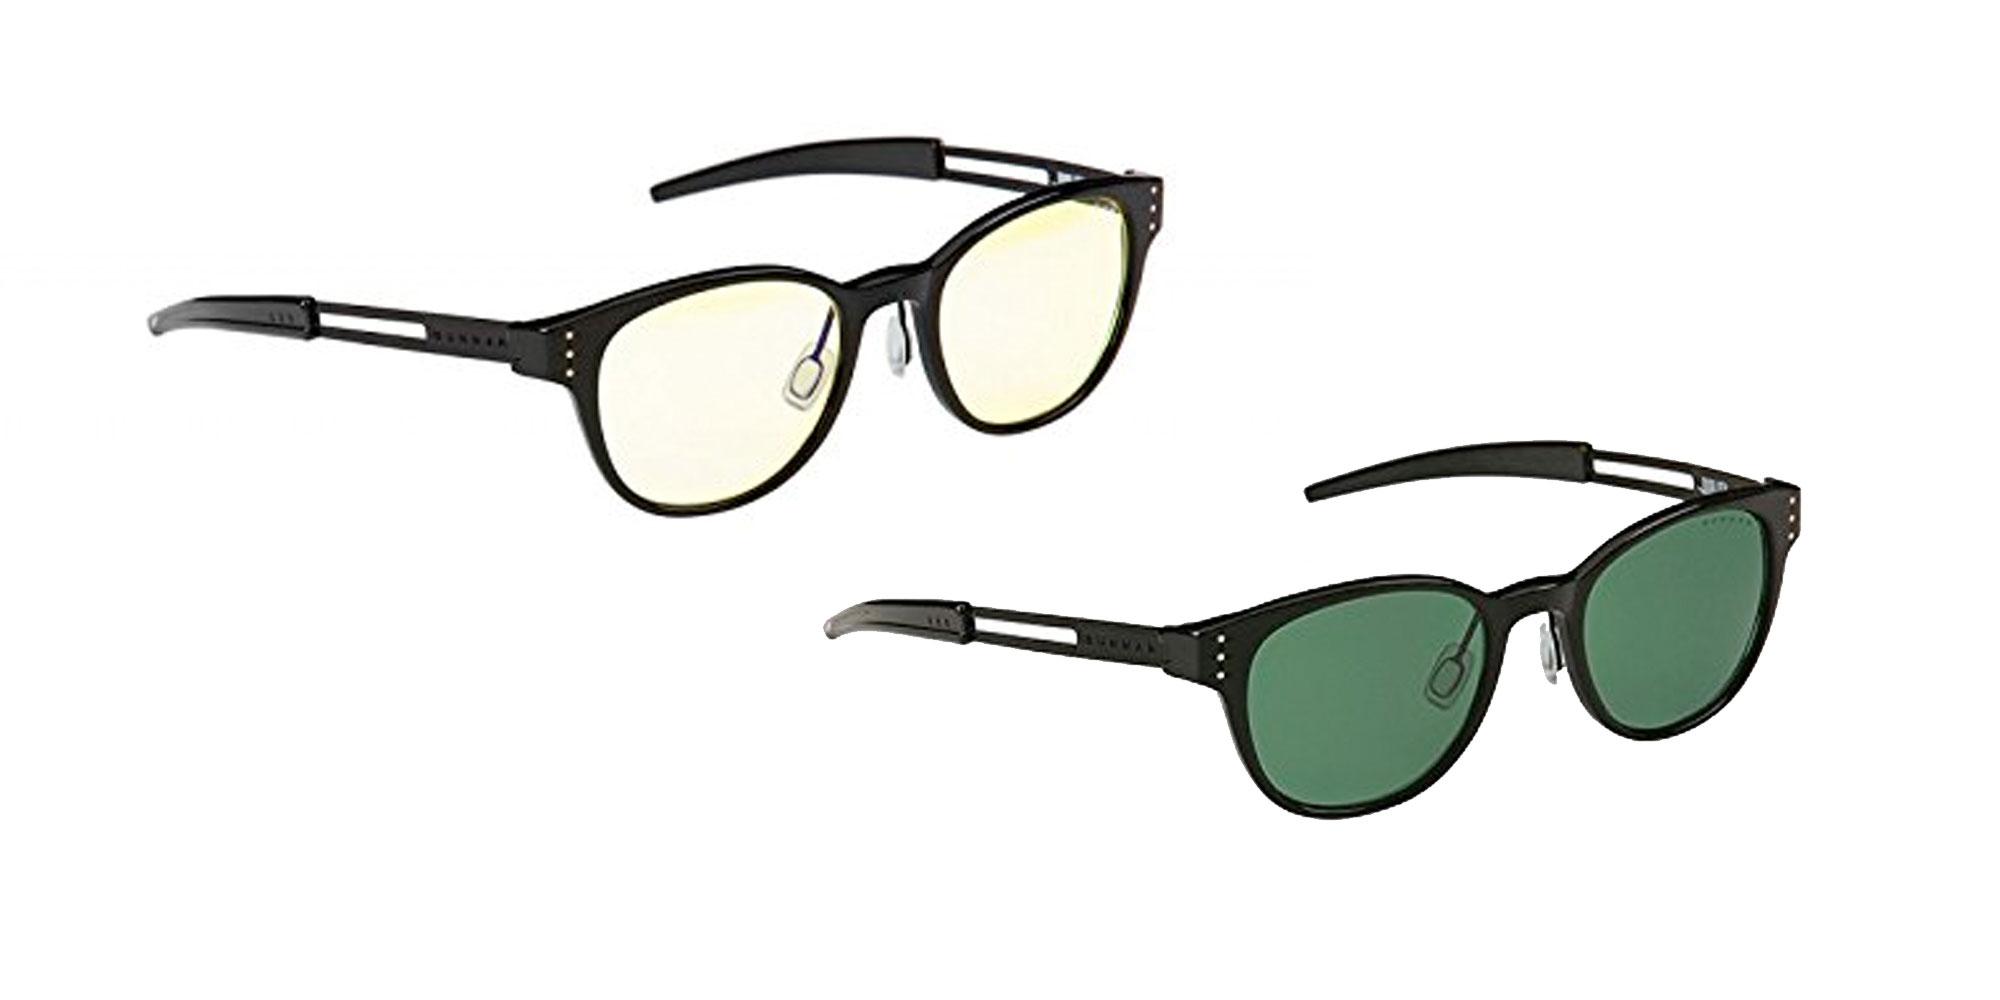 Sleep better at night w/ GUNNAR Optiks gaming & computer blue light filter glasses: $46 (Reg. $70+)